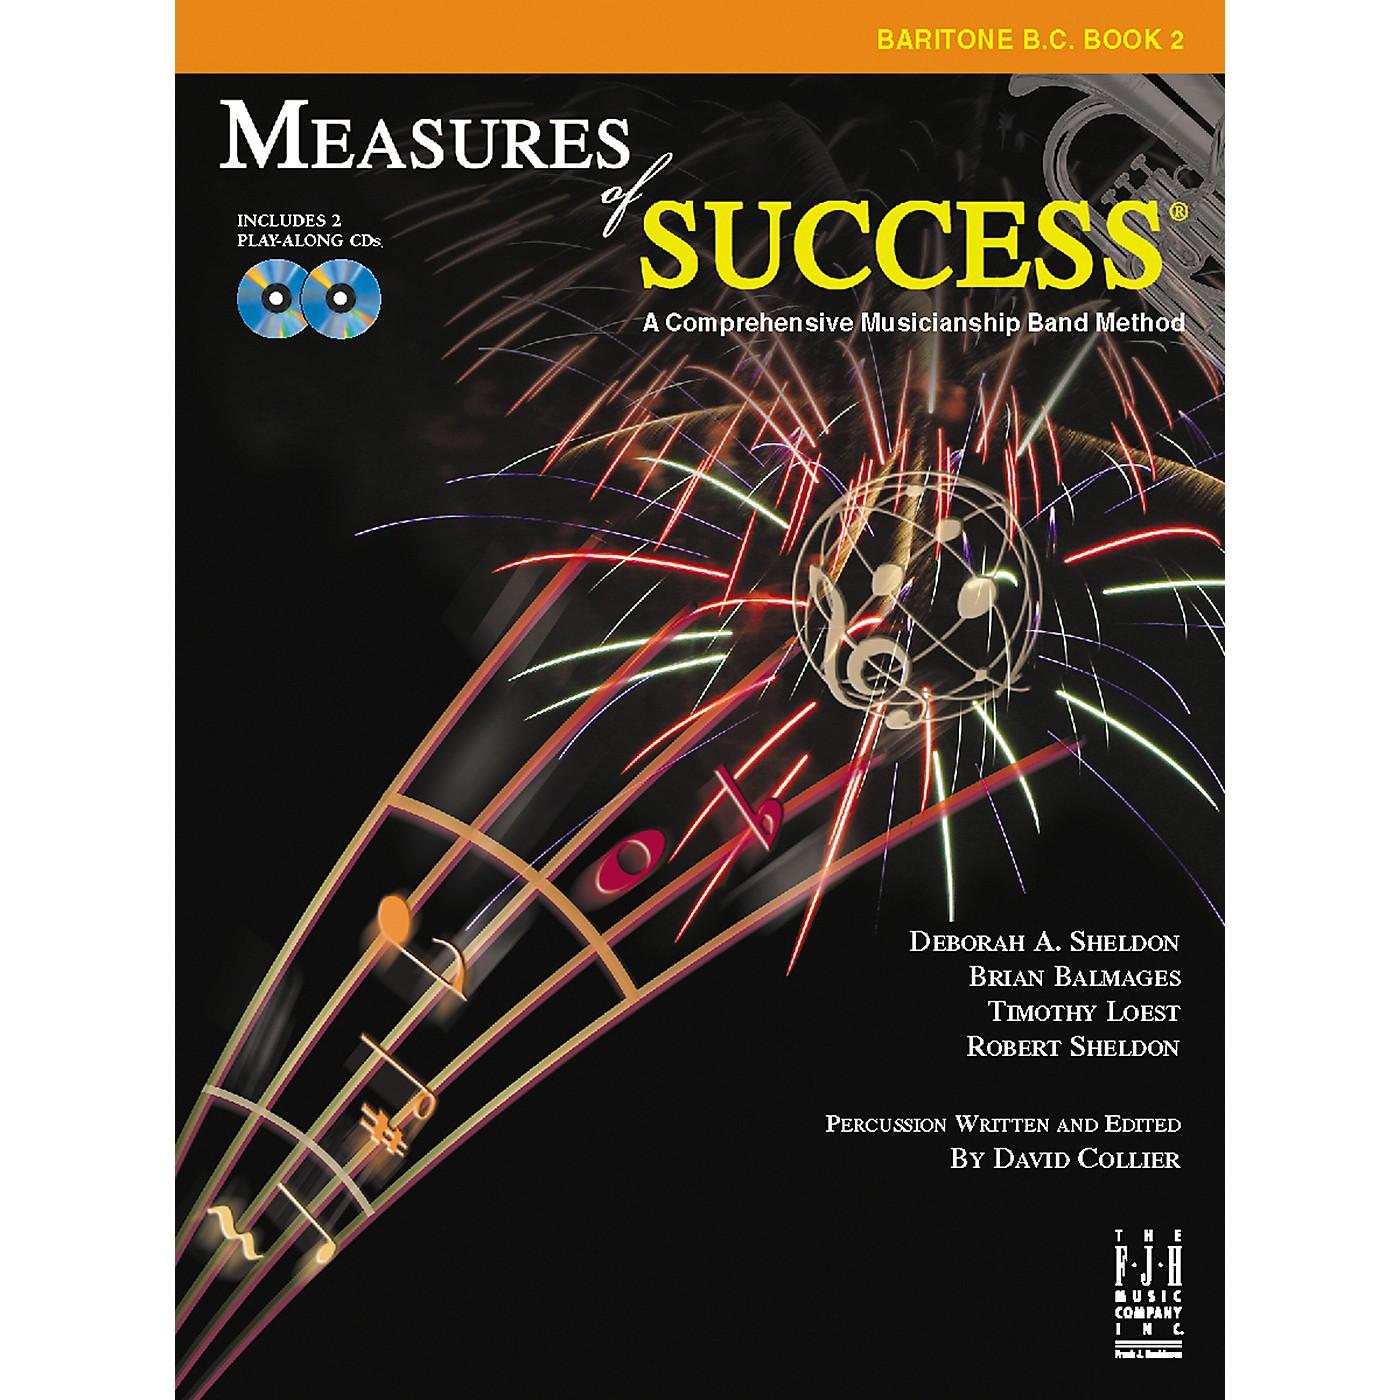 FJH Music Measures of Success Baritone B.C. Book 2 thumbnail